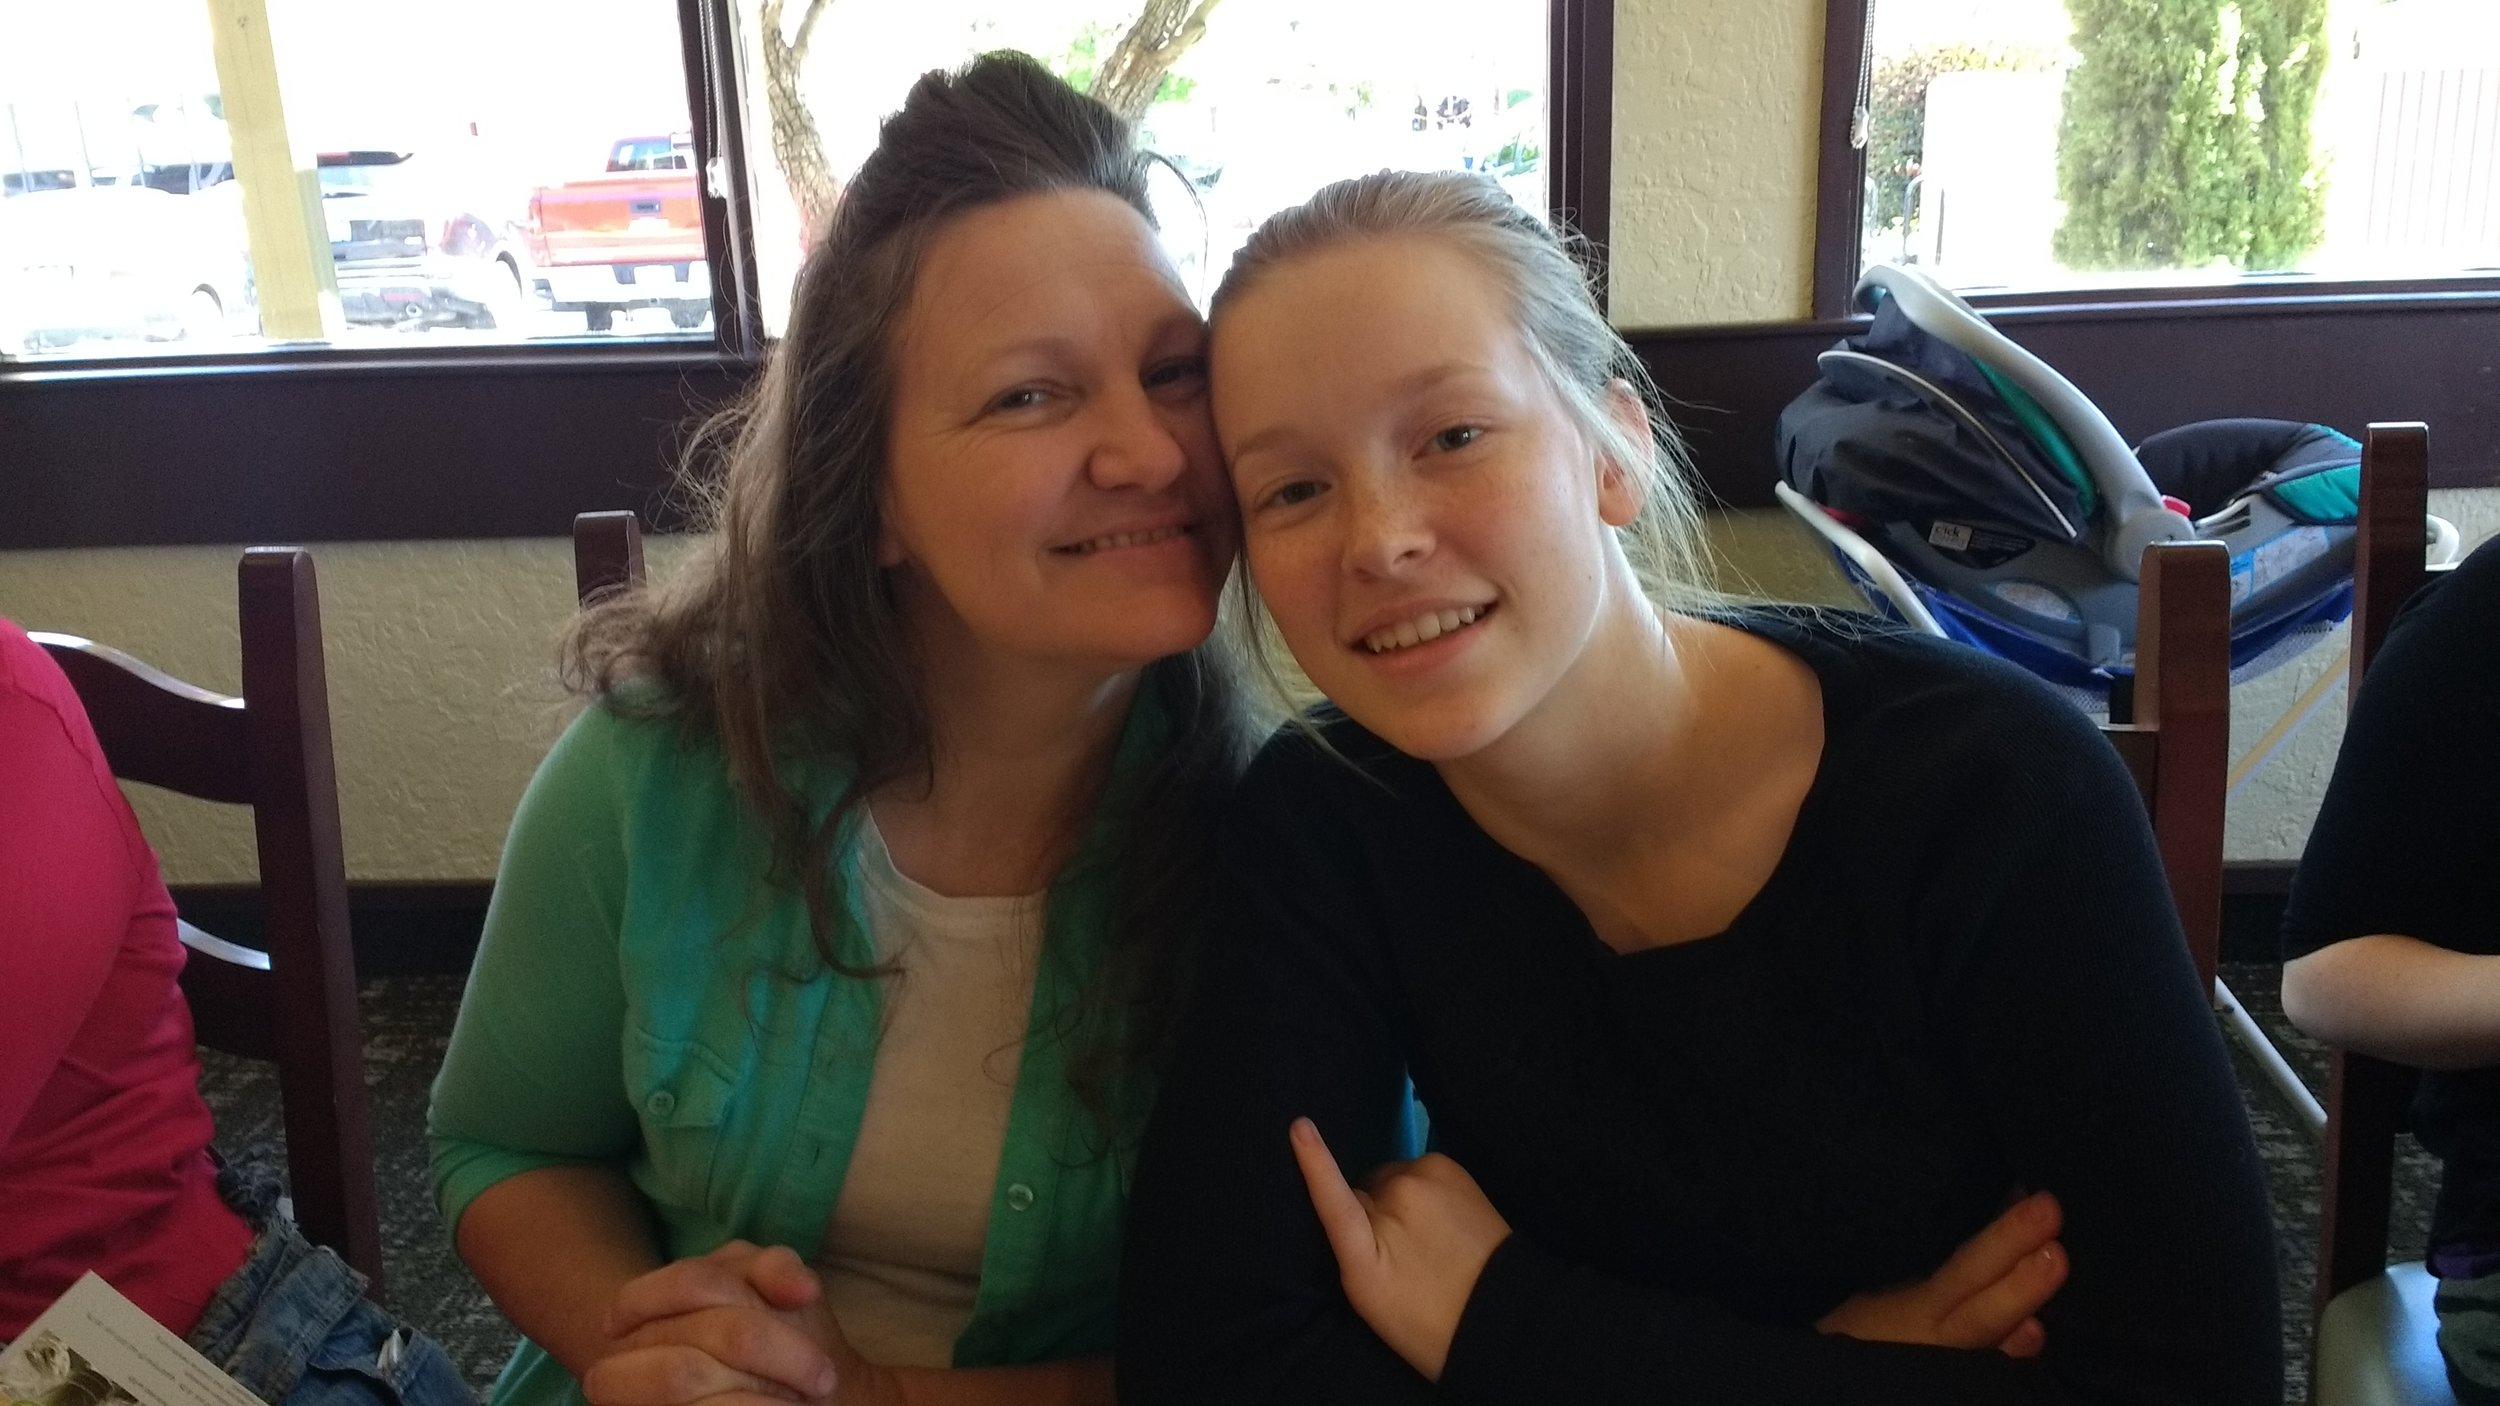 Sis. Jacquie and daughter Sis. Chloe